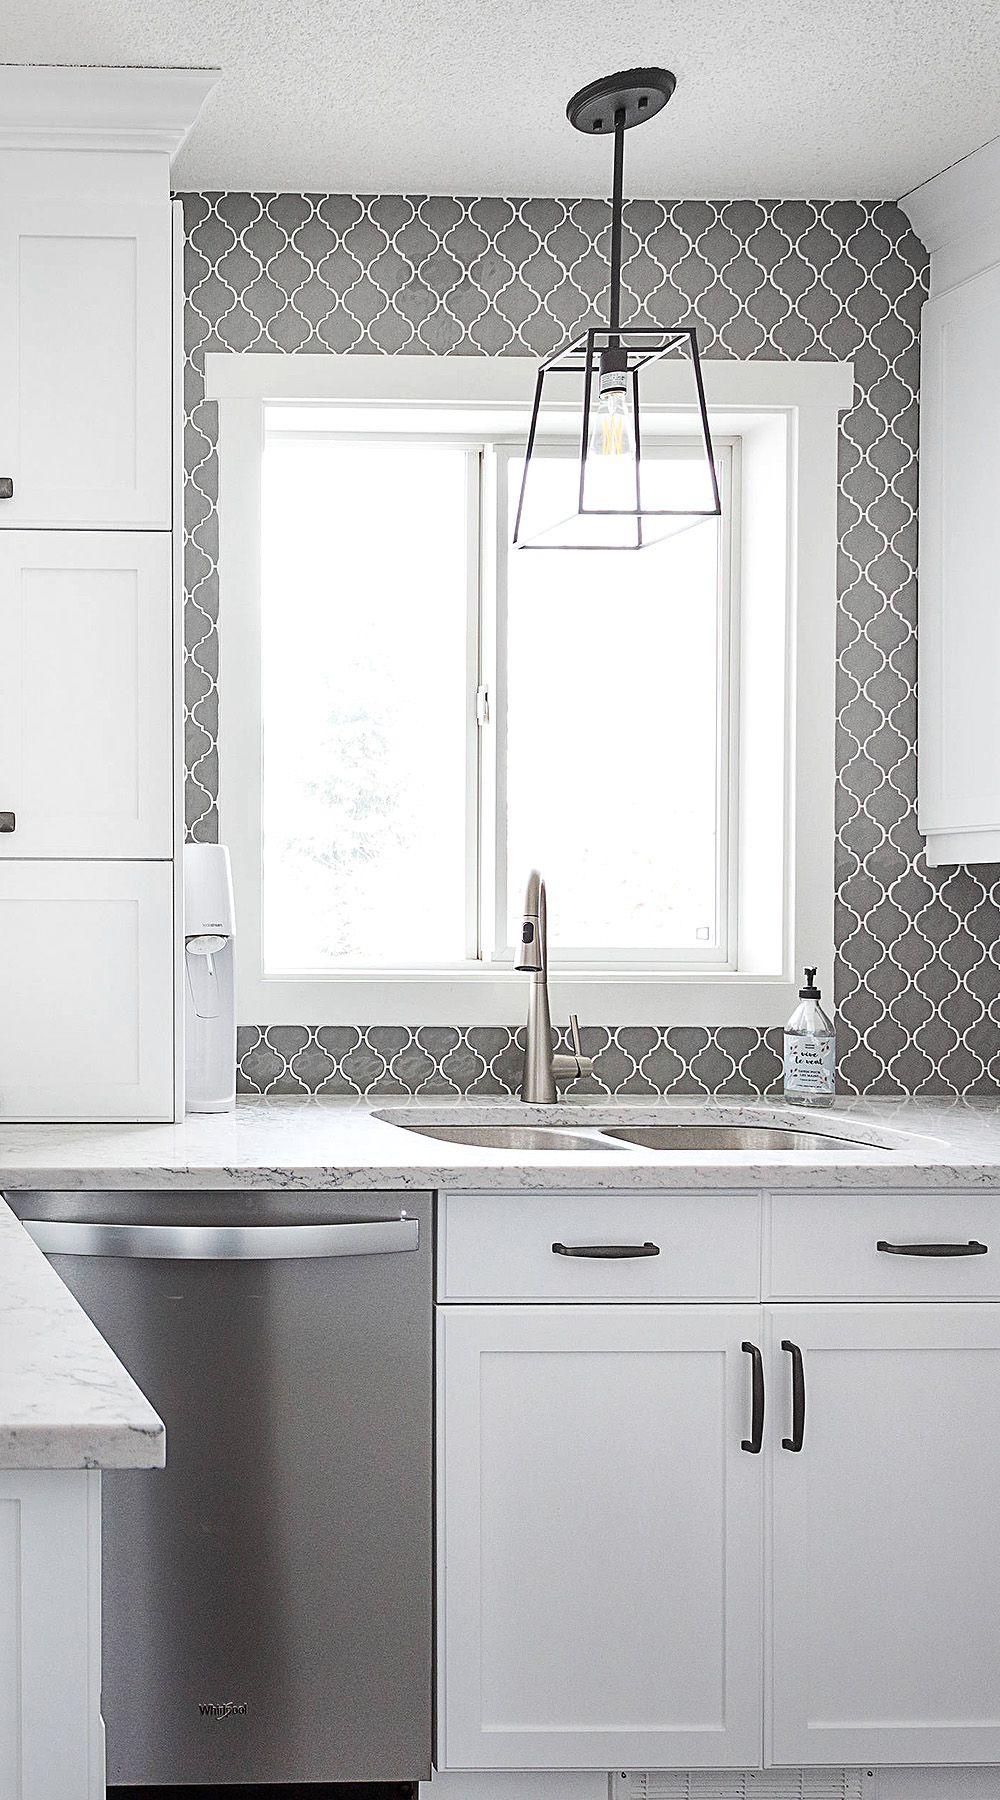 Pin On Gray Kitchen Backsplash Tiles Gray Tile Ideas